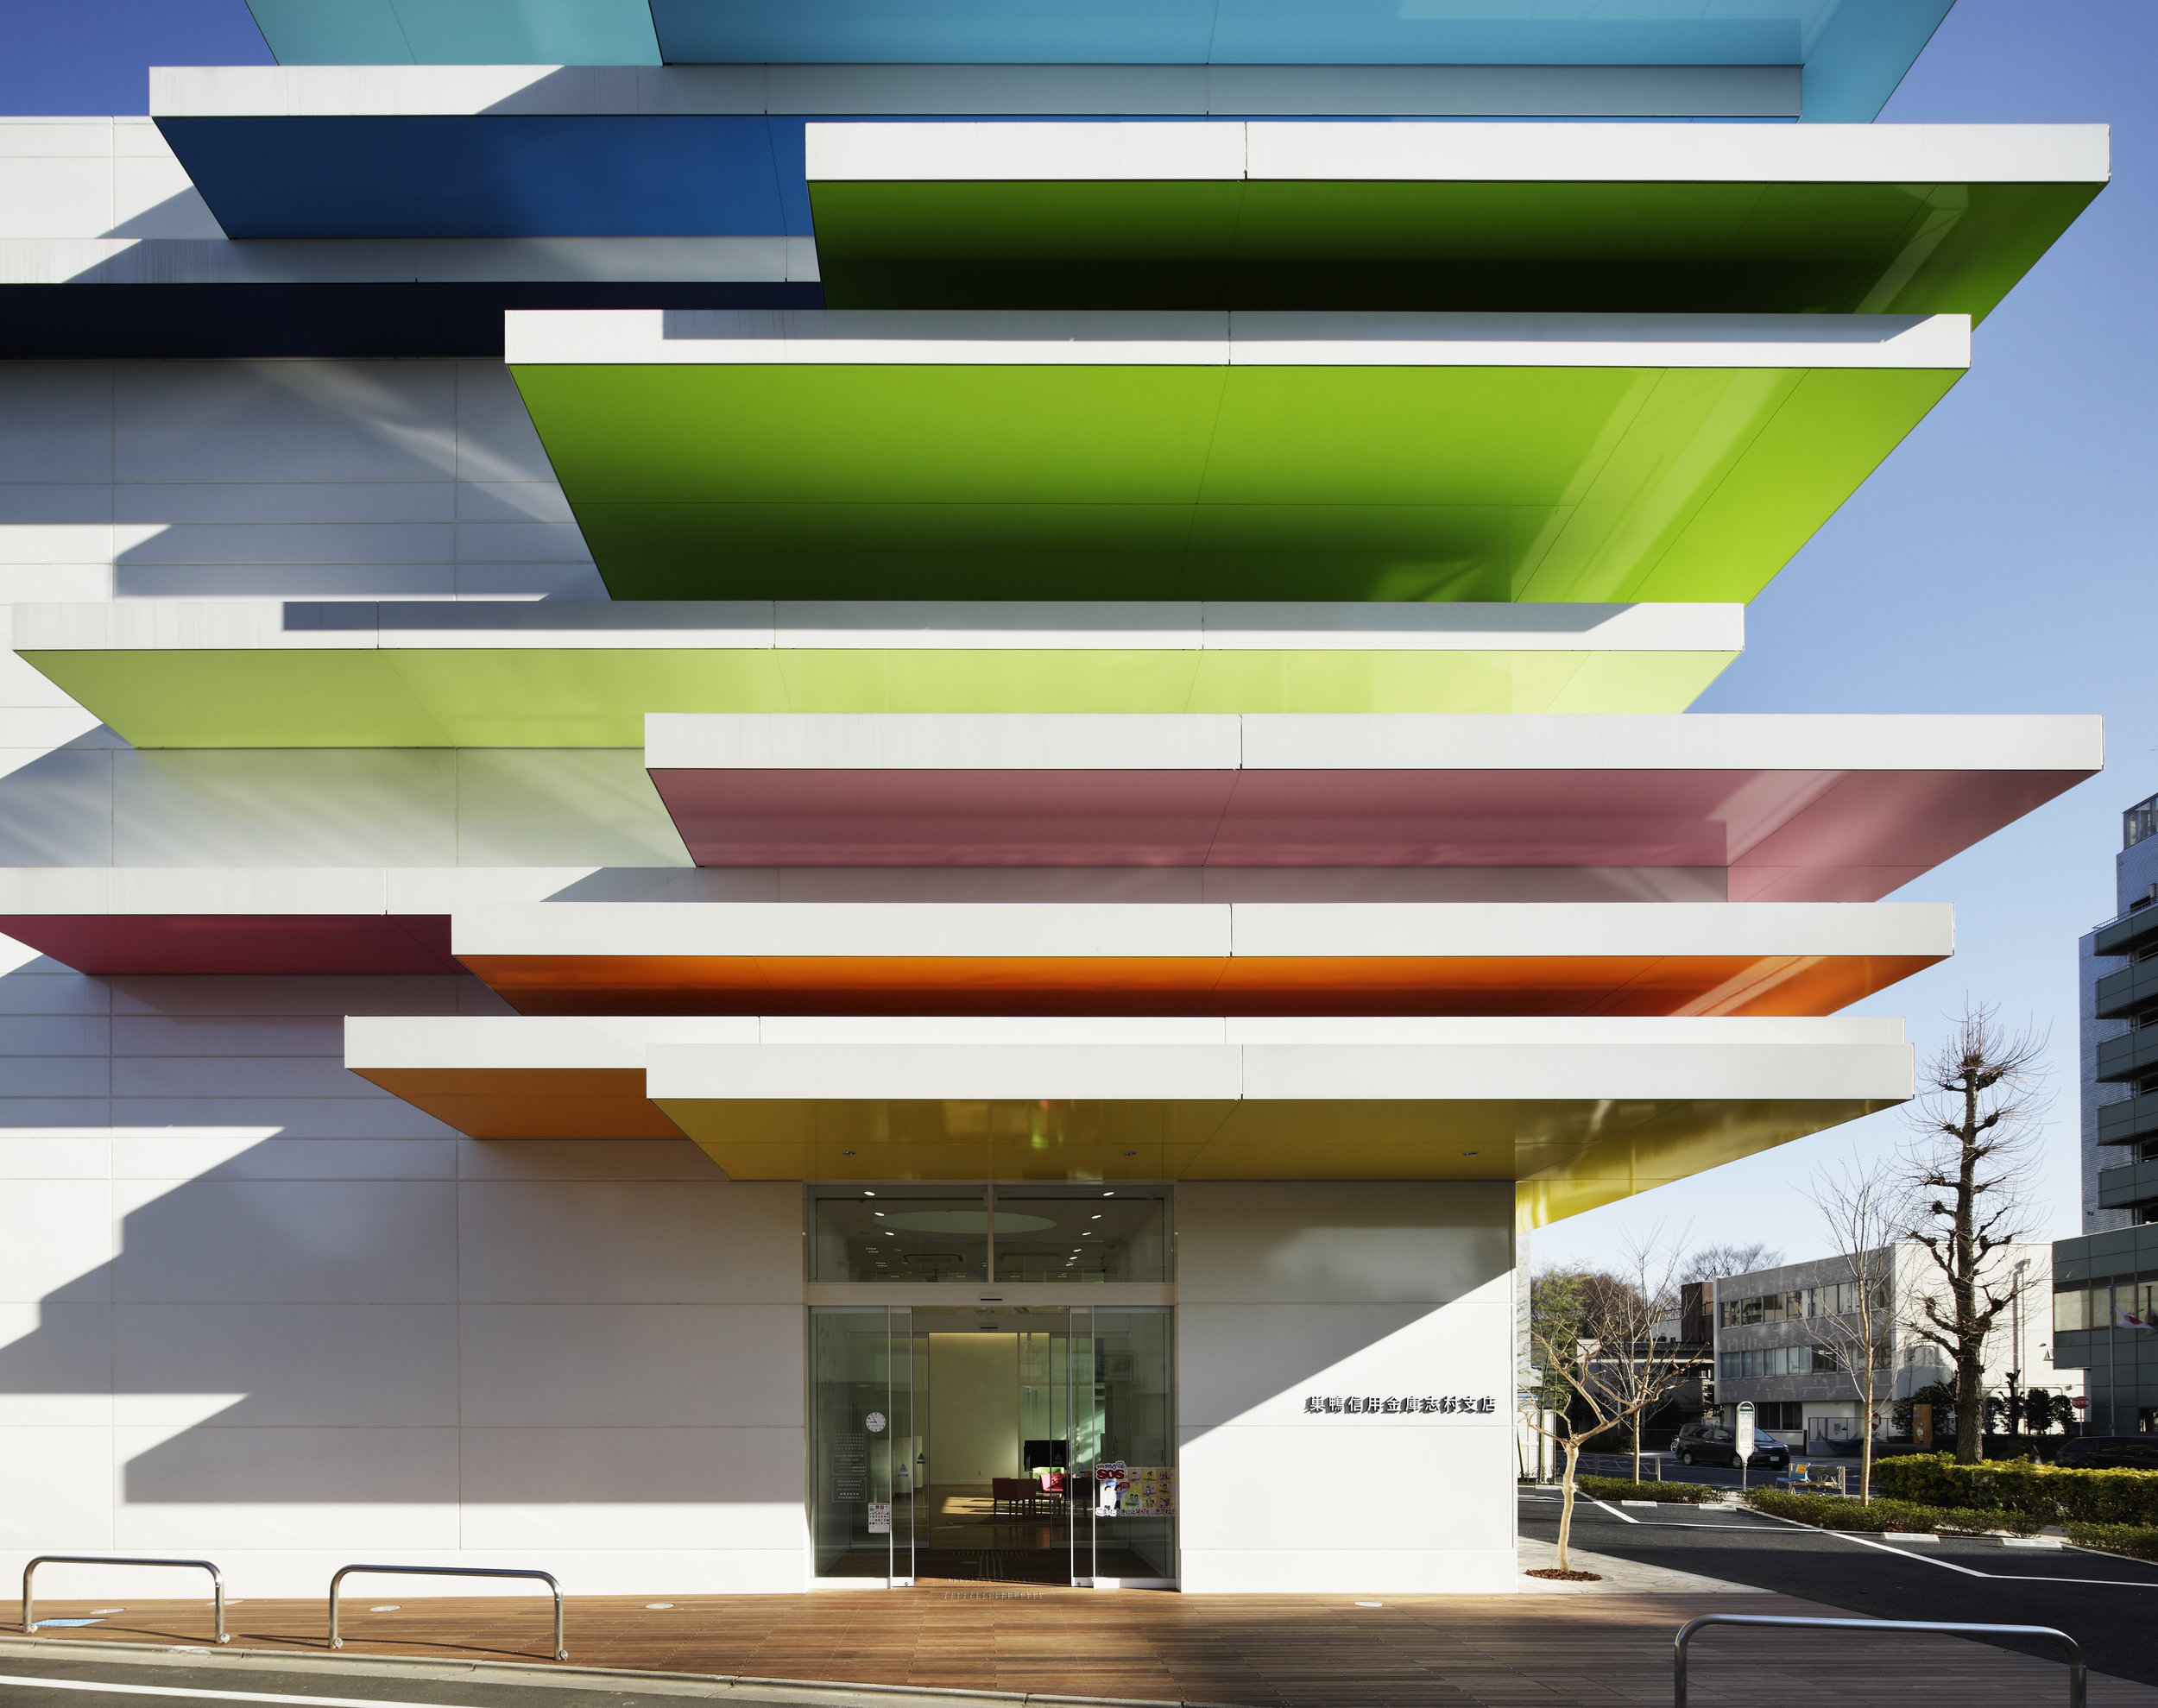 Project : Sugamo Shinkin Bank / Shimura branch open 2011/3   Architecture : emmanuelle moureaux (emmanuelle moureaux architecture + design) Interior Design / Sign Design : emmanuelle moureaux (emmanuelle moureaux architecture + design) Photography : Daisuke Shima / Nacasa & Partners Inc.